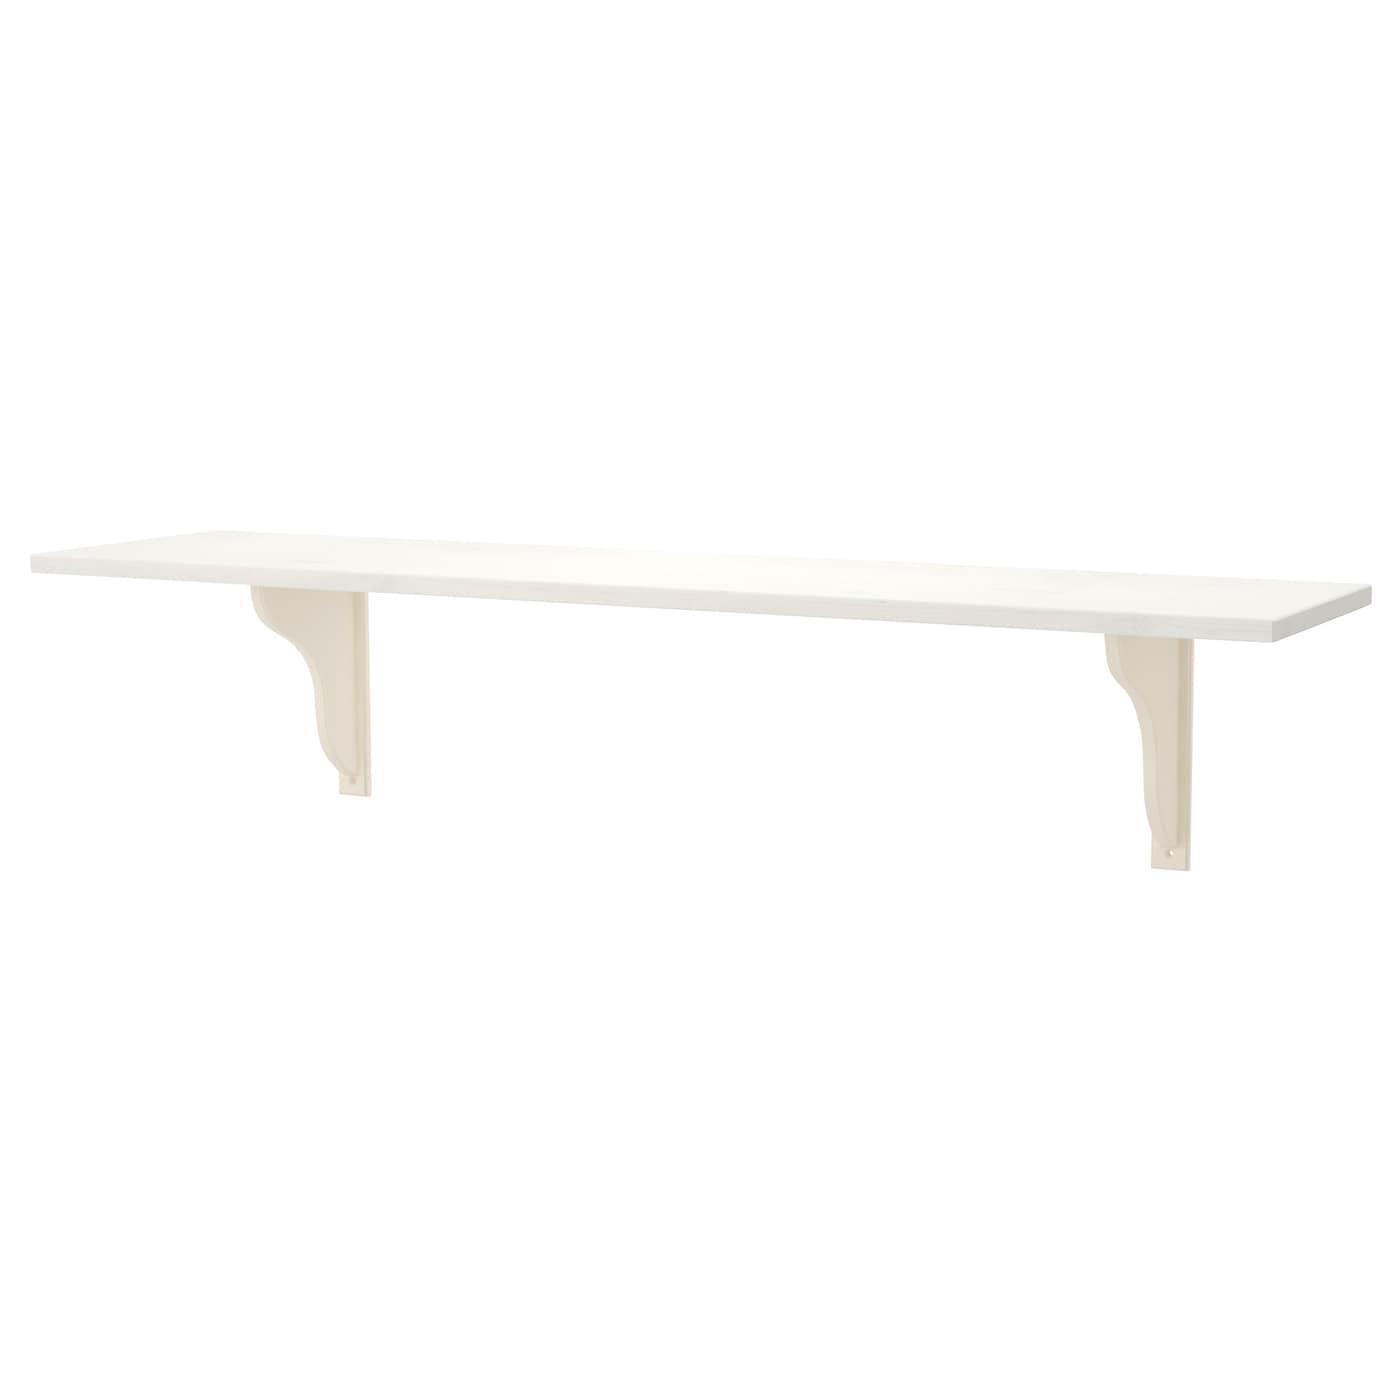 Ikea Ekby Hensvik Hemnes Wall Shelf Solid Wood Is A Durable Natural Material